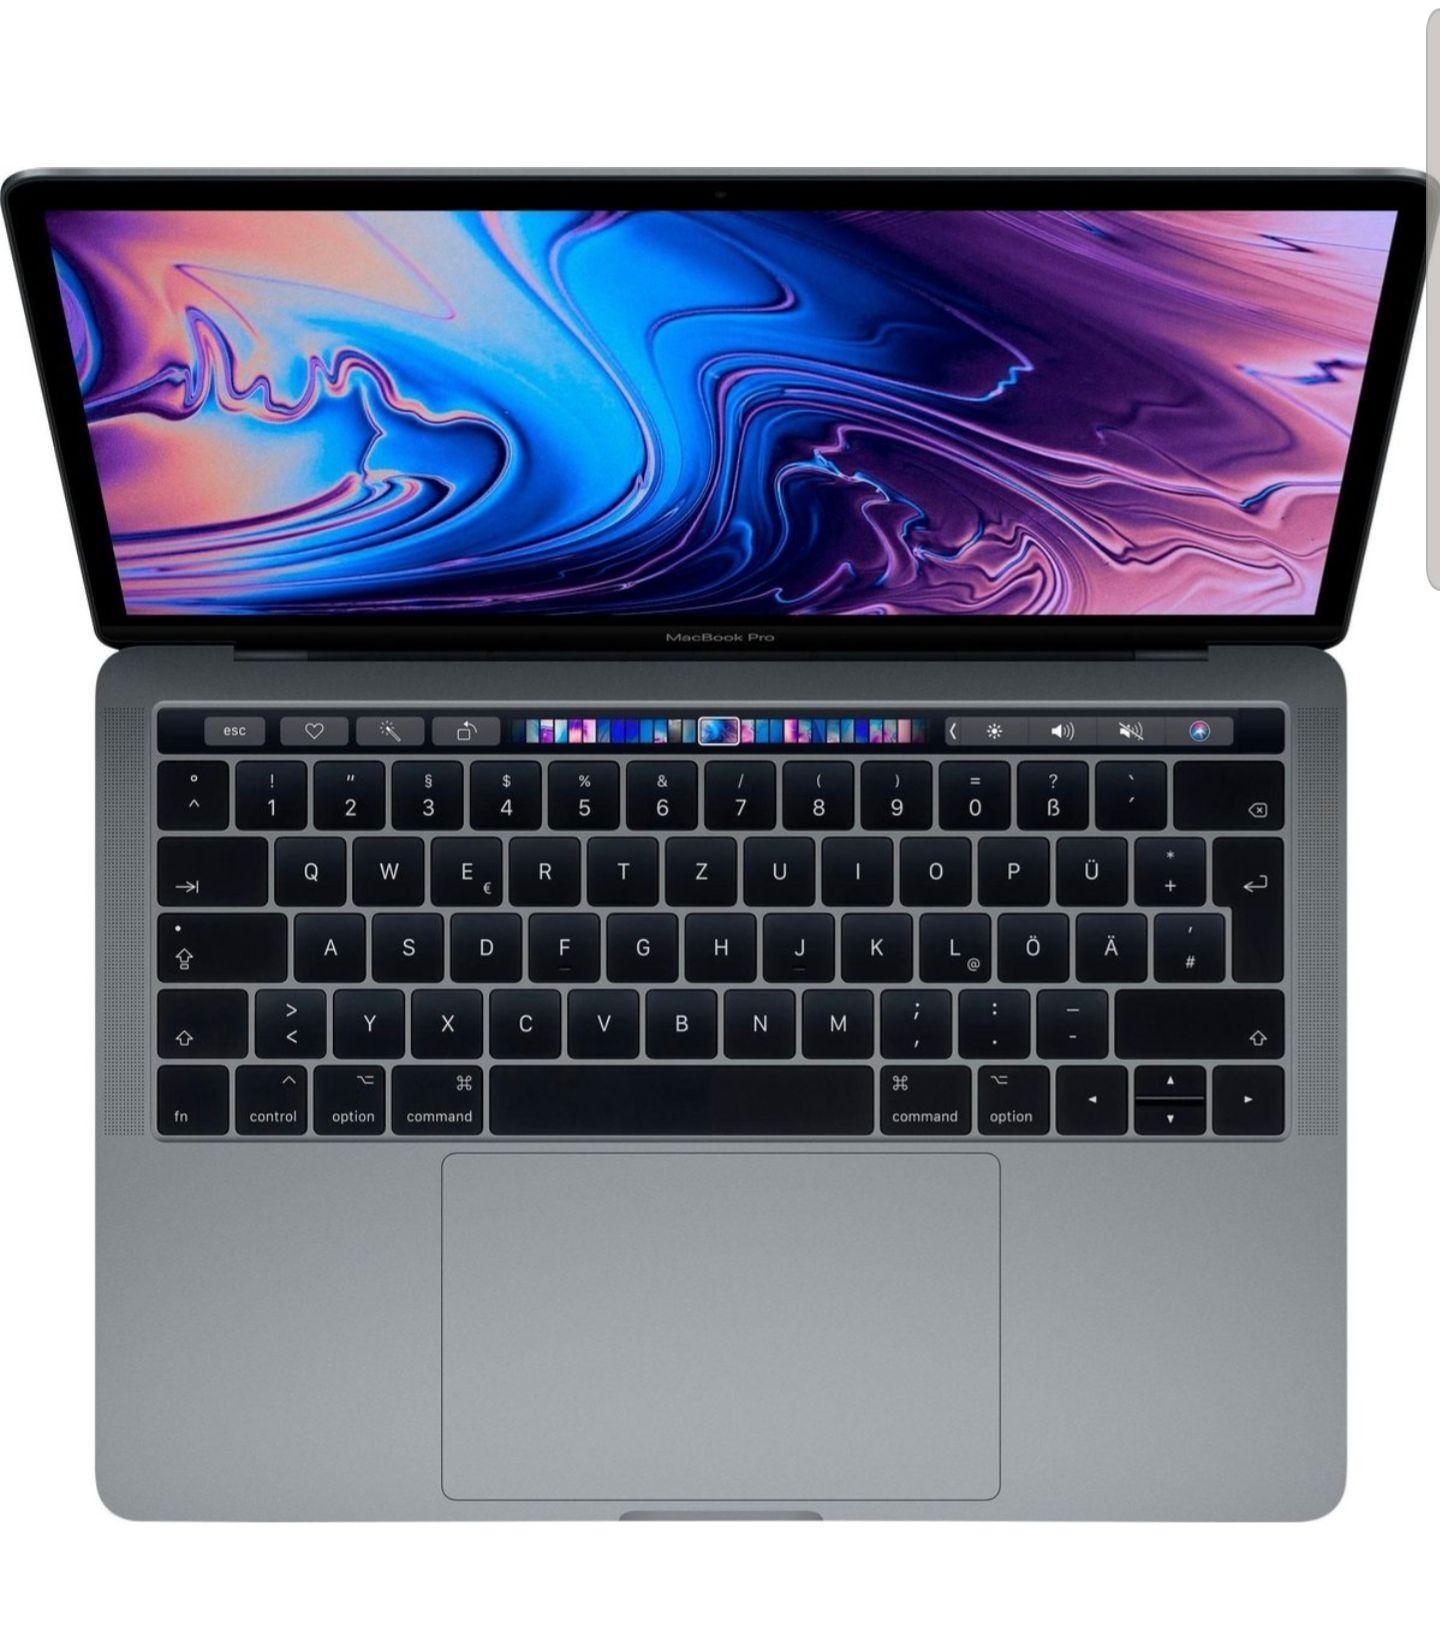 "Apple MacBook Pro 13"" (2019) Touch Bar Notebook (33,78 cm/13,3 Zoll, Intel Core i5, 512 GB SSD) Cashback 34995 PointsmitRakuten Club Karte"